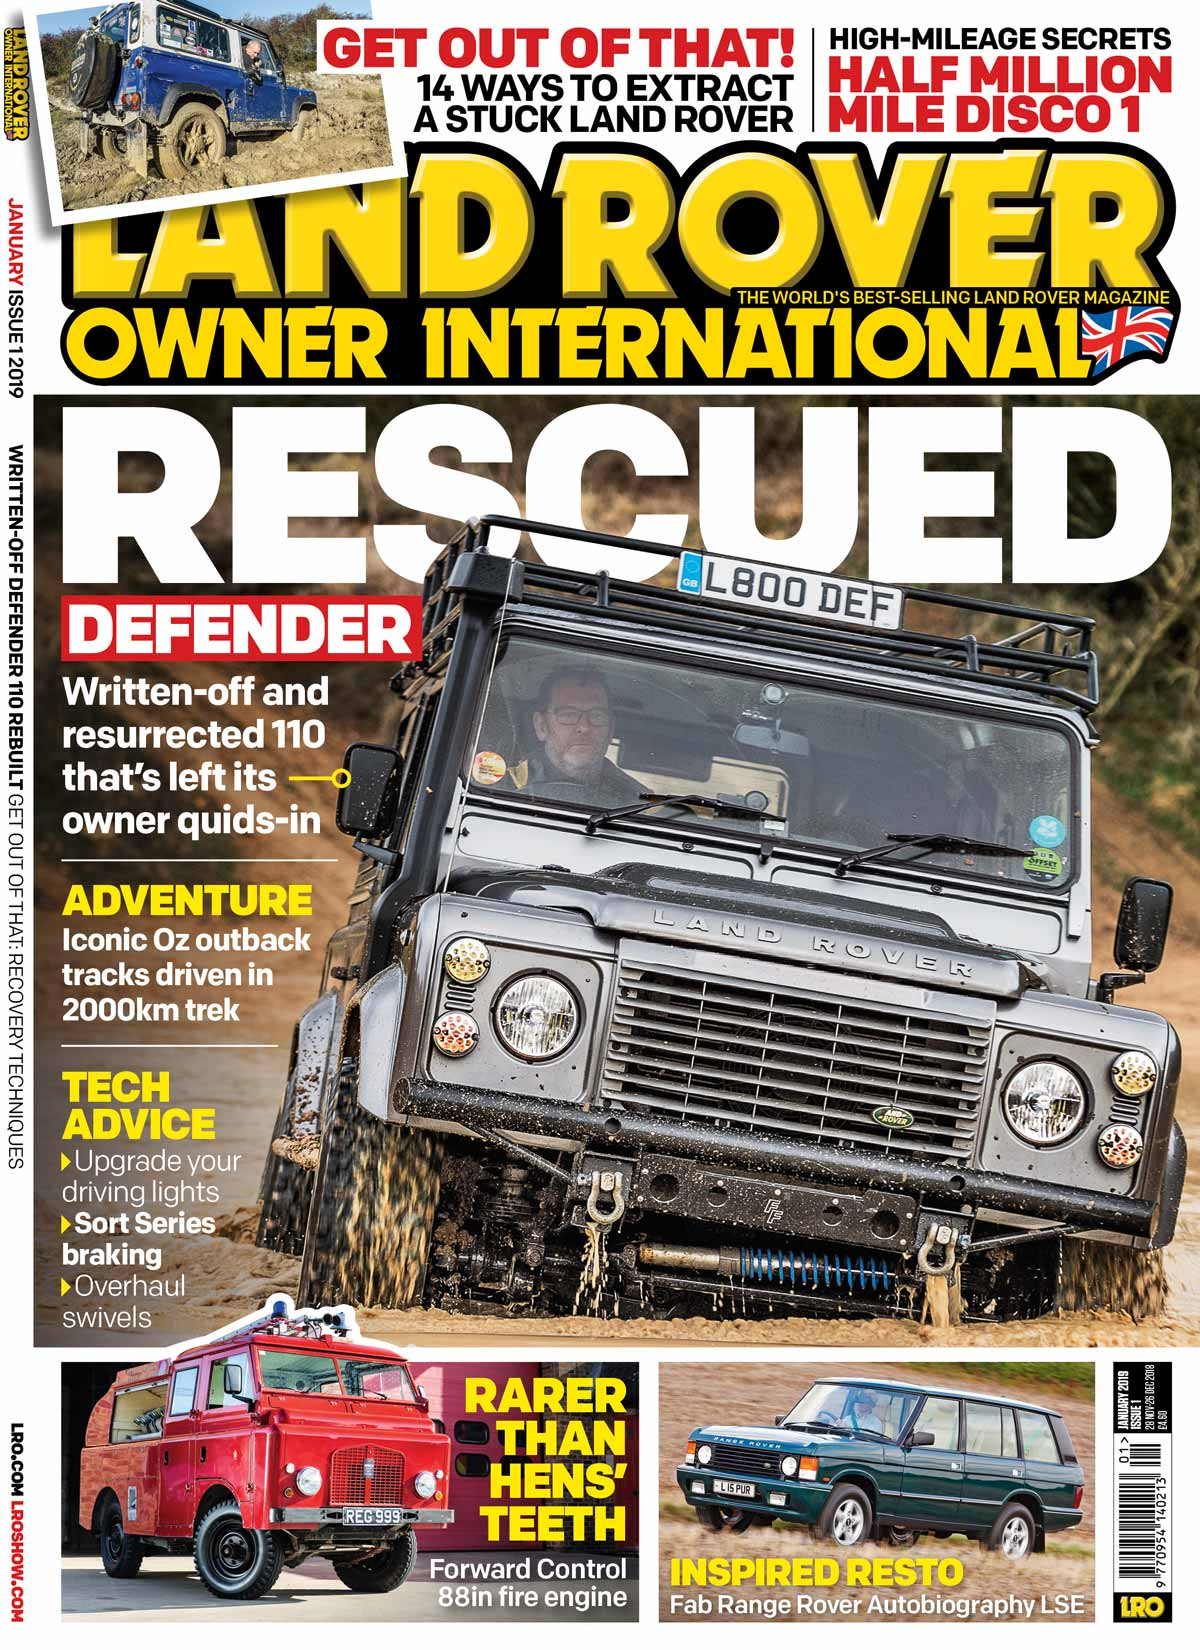 LRO January 2019 cover